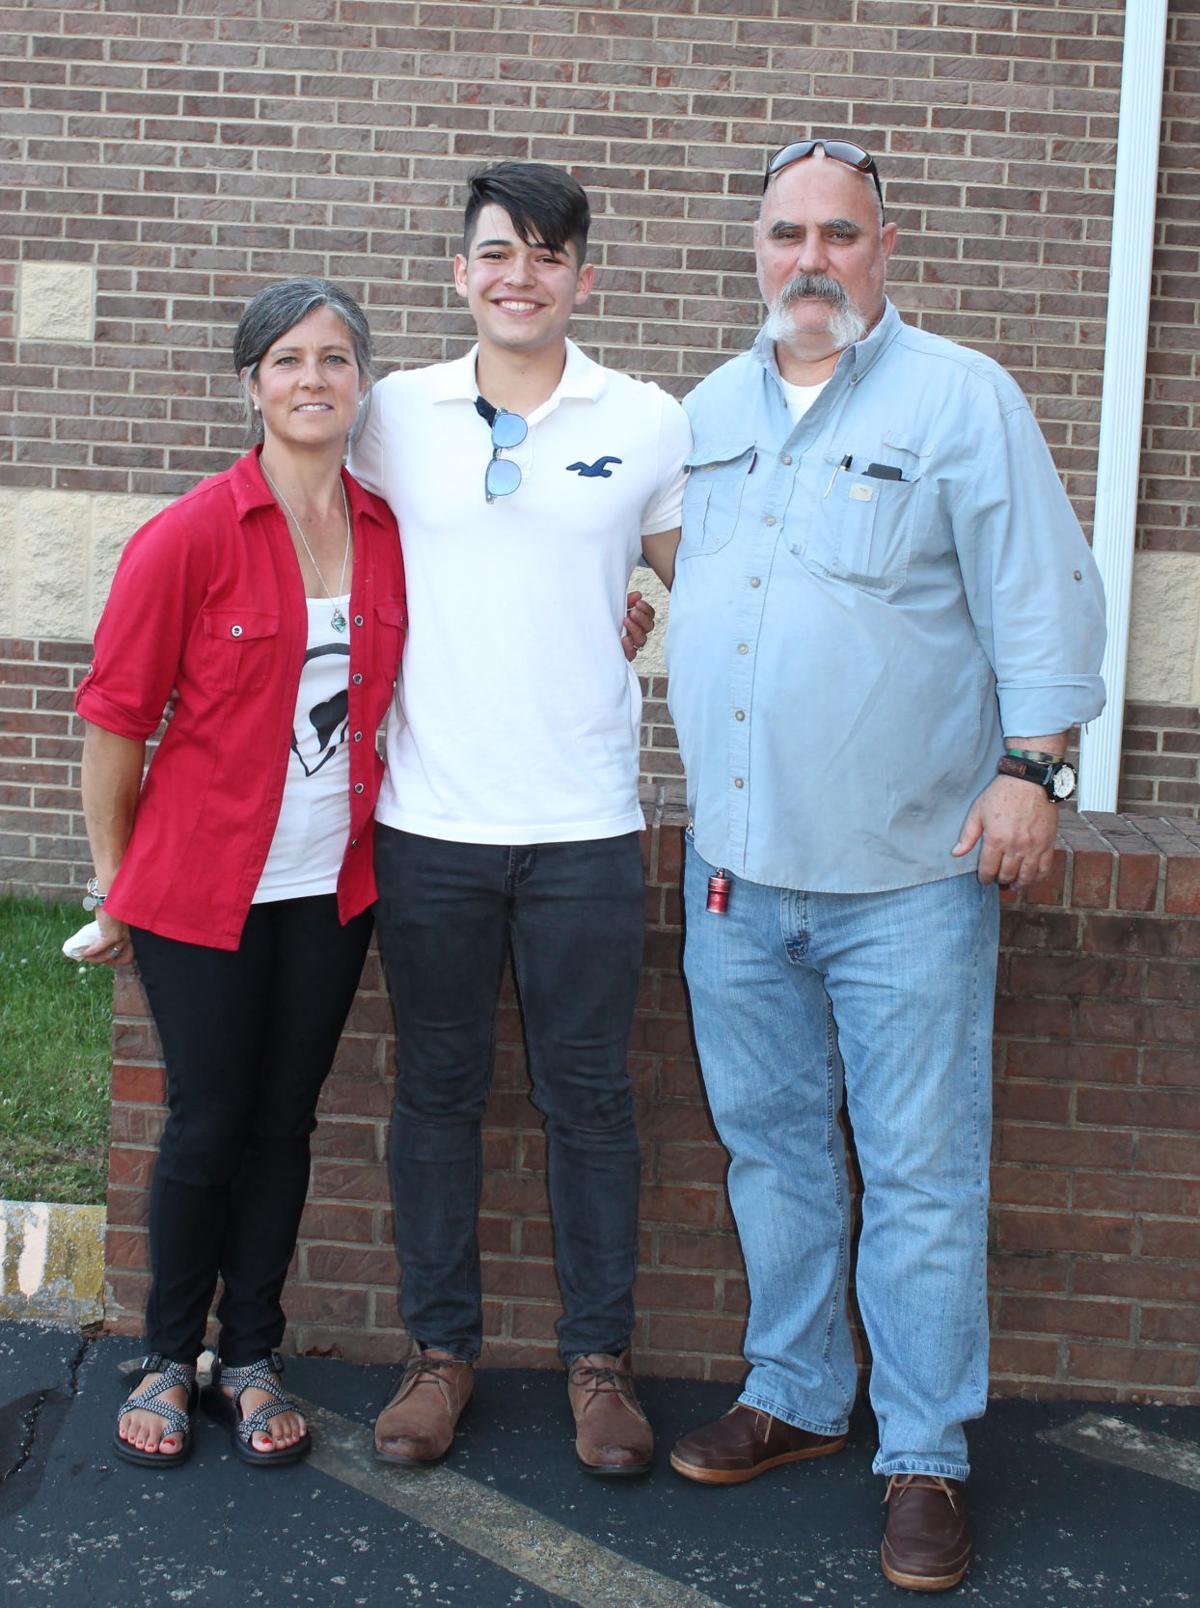 Justin Arias awarded Snellgrose Scholarship